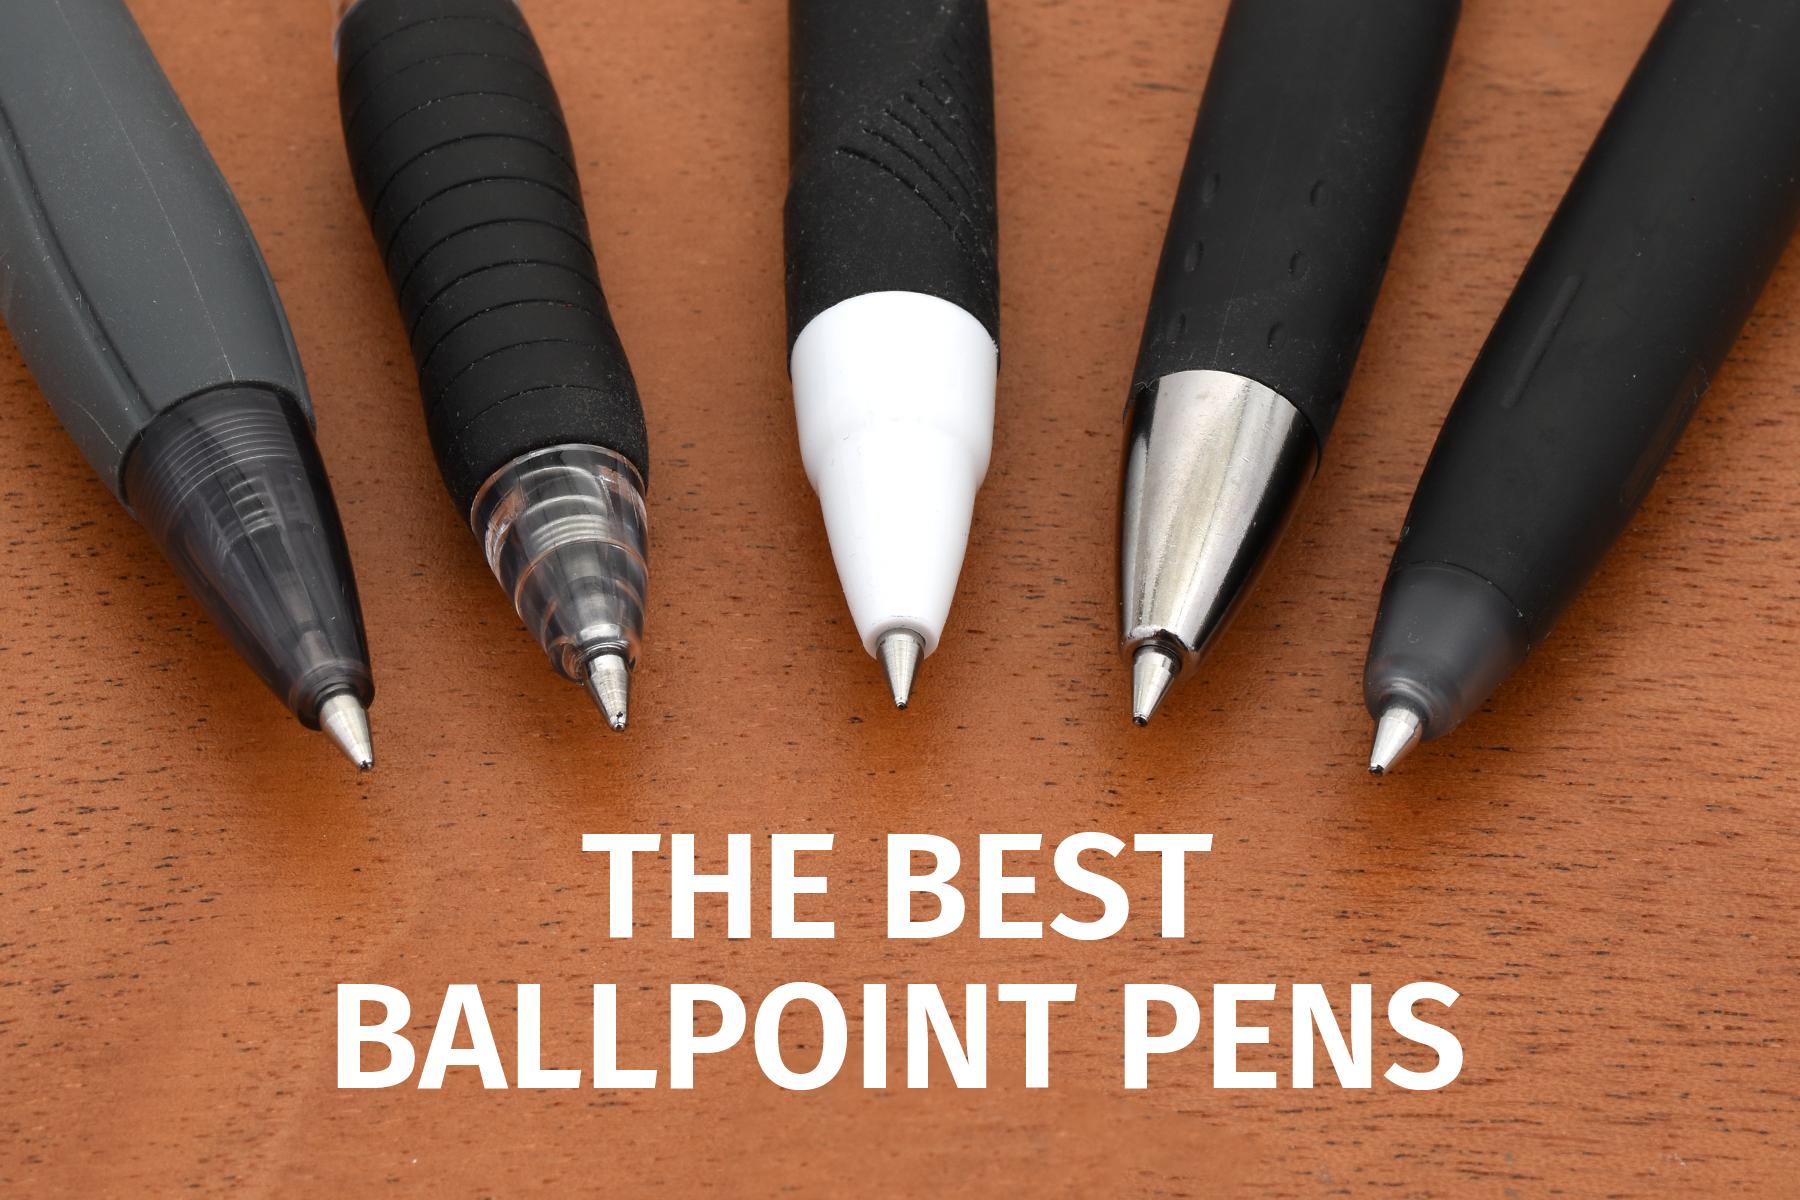 The Best Ballpoint Pens | JetPens